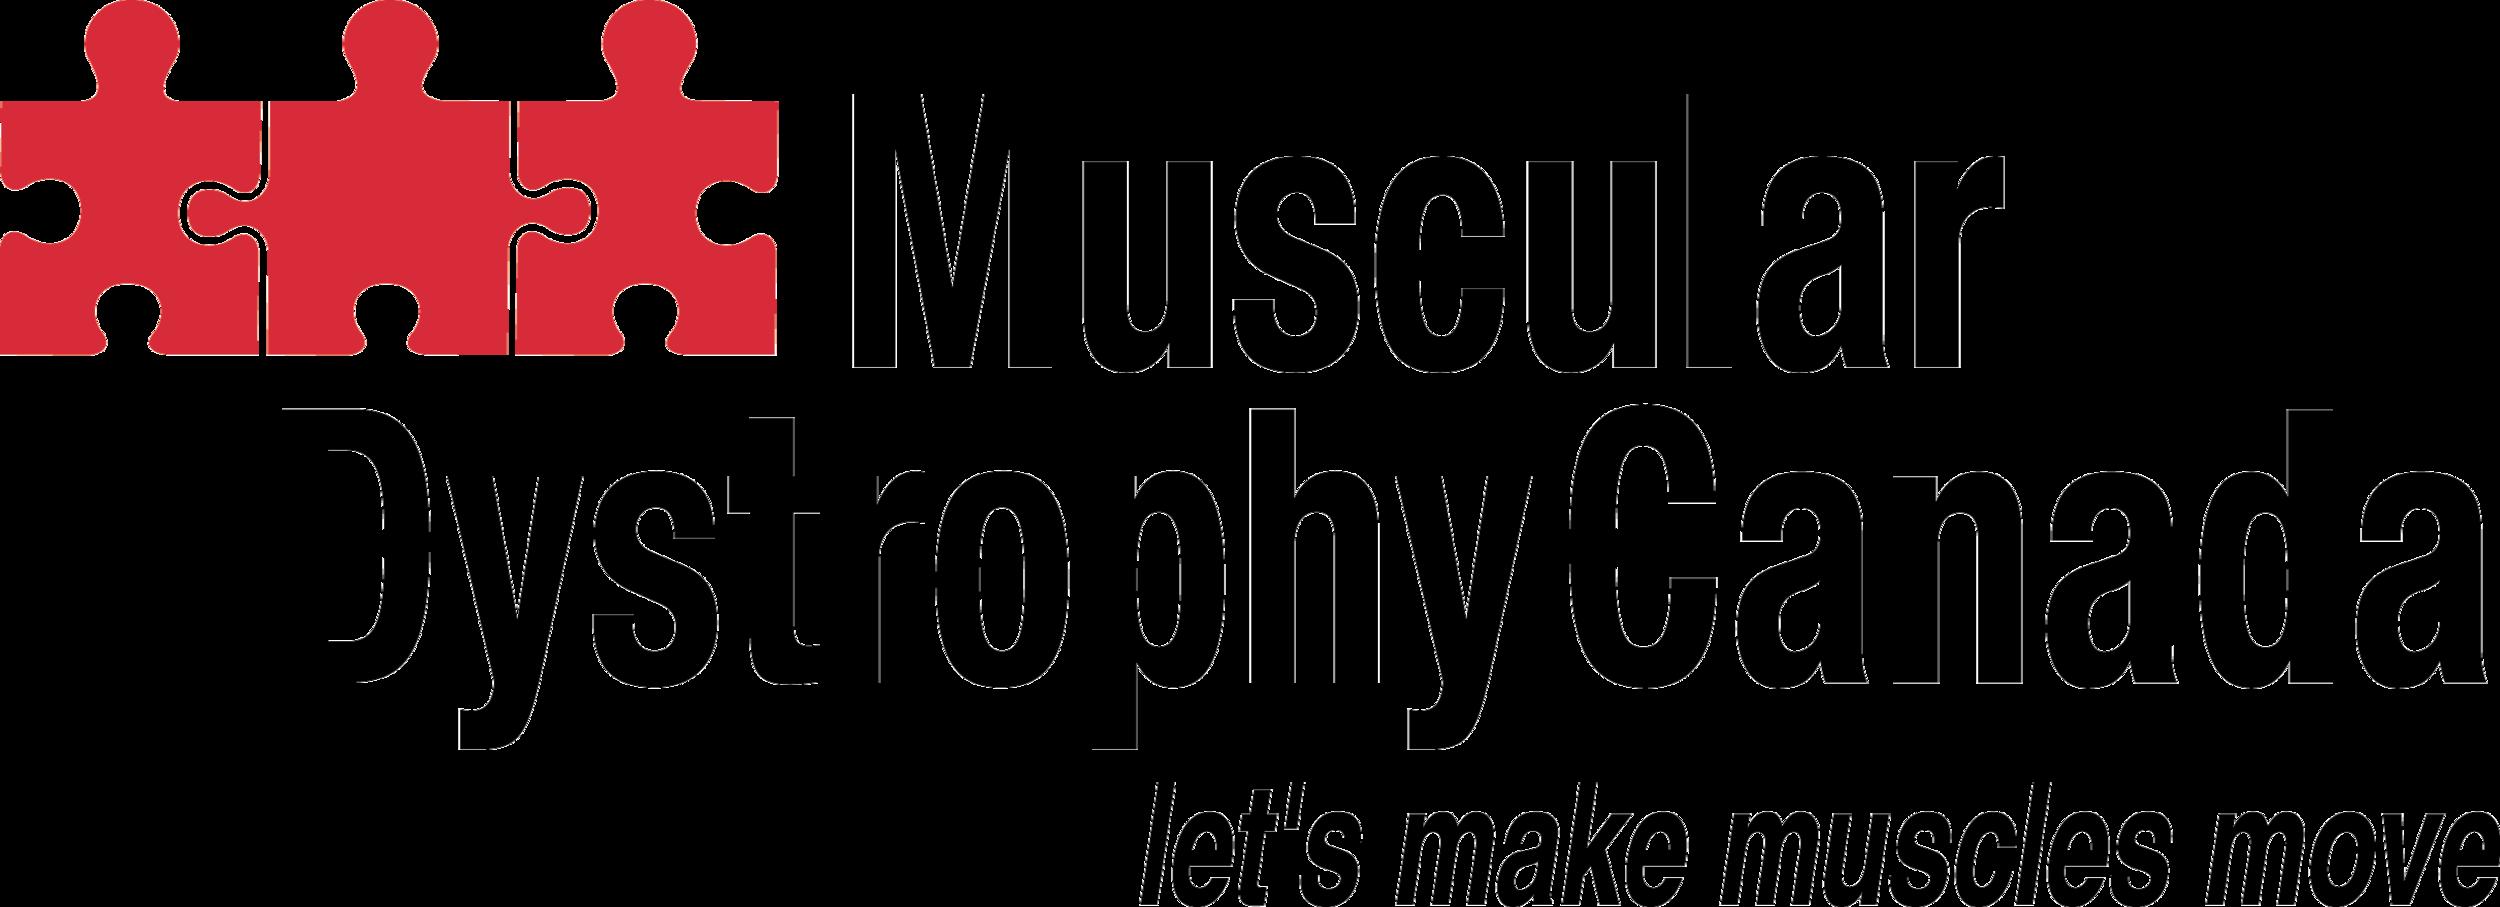 MDC logo png.png